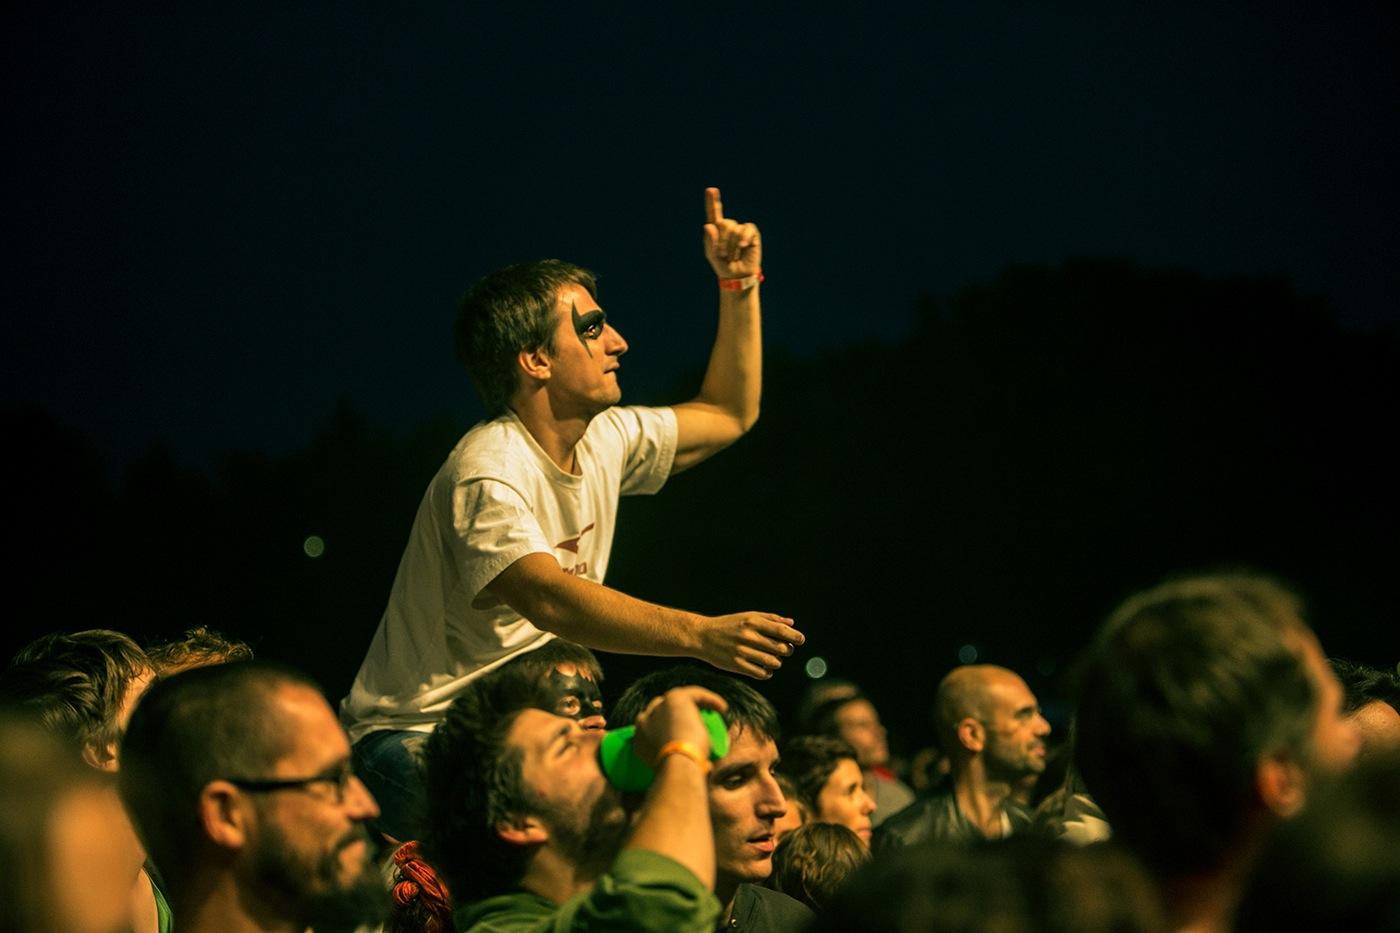 photographe-reportage-festival-rockadel-guillaume-heraud-007-small